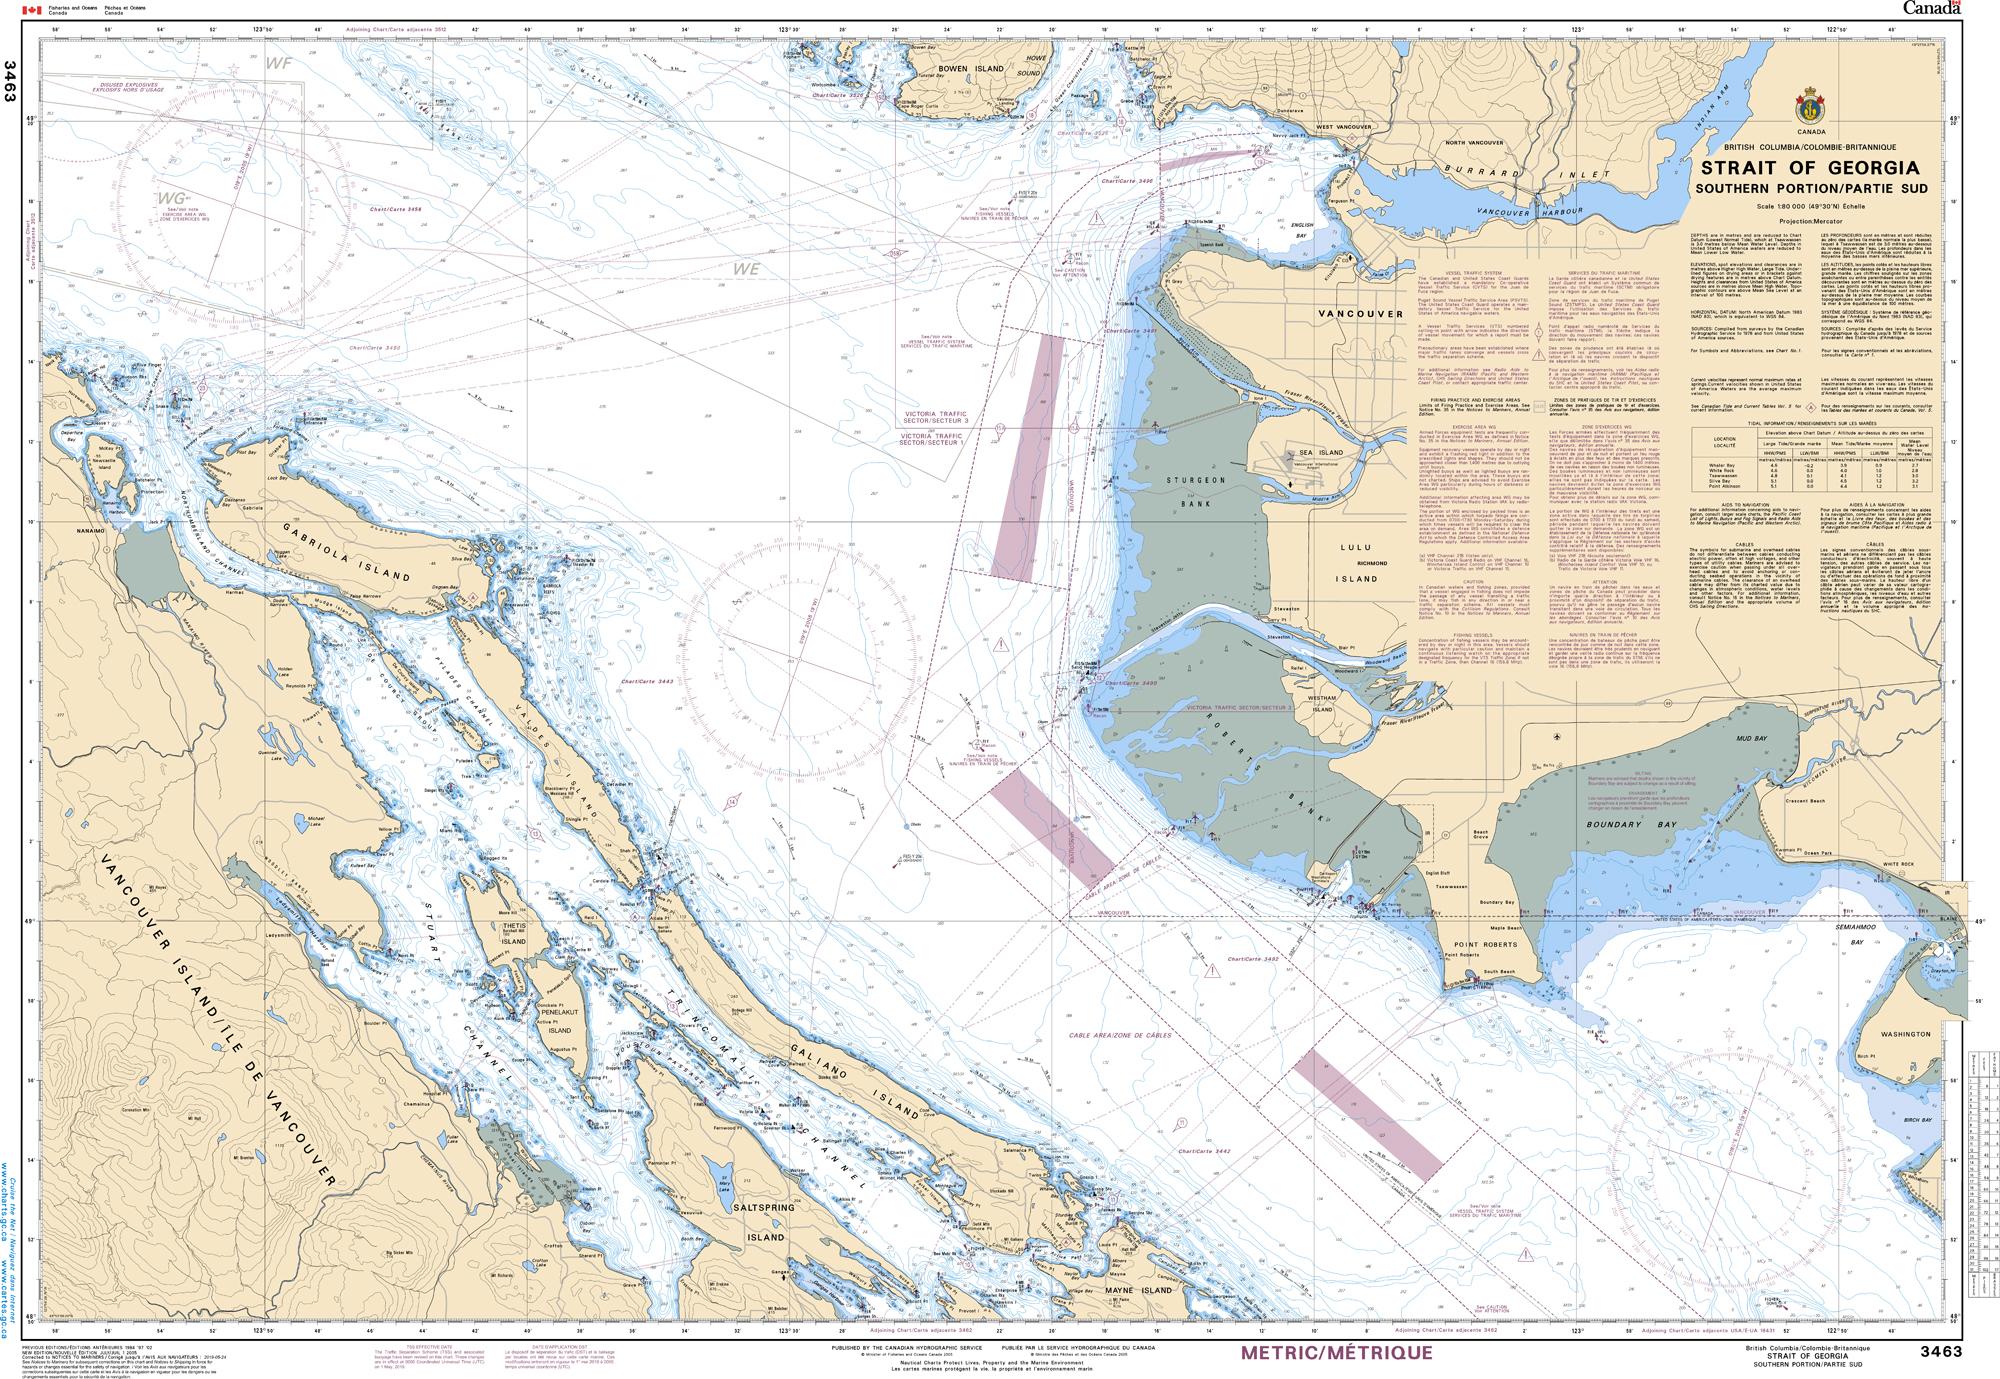 Pacific Region, CHS Chart 3463: Strait of Georgia, Southern Portion/Partie Sud